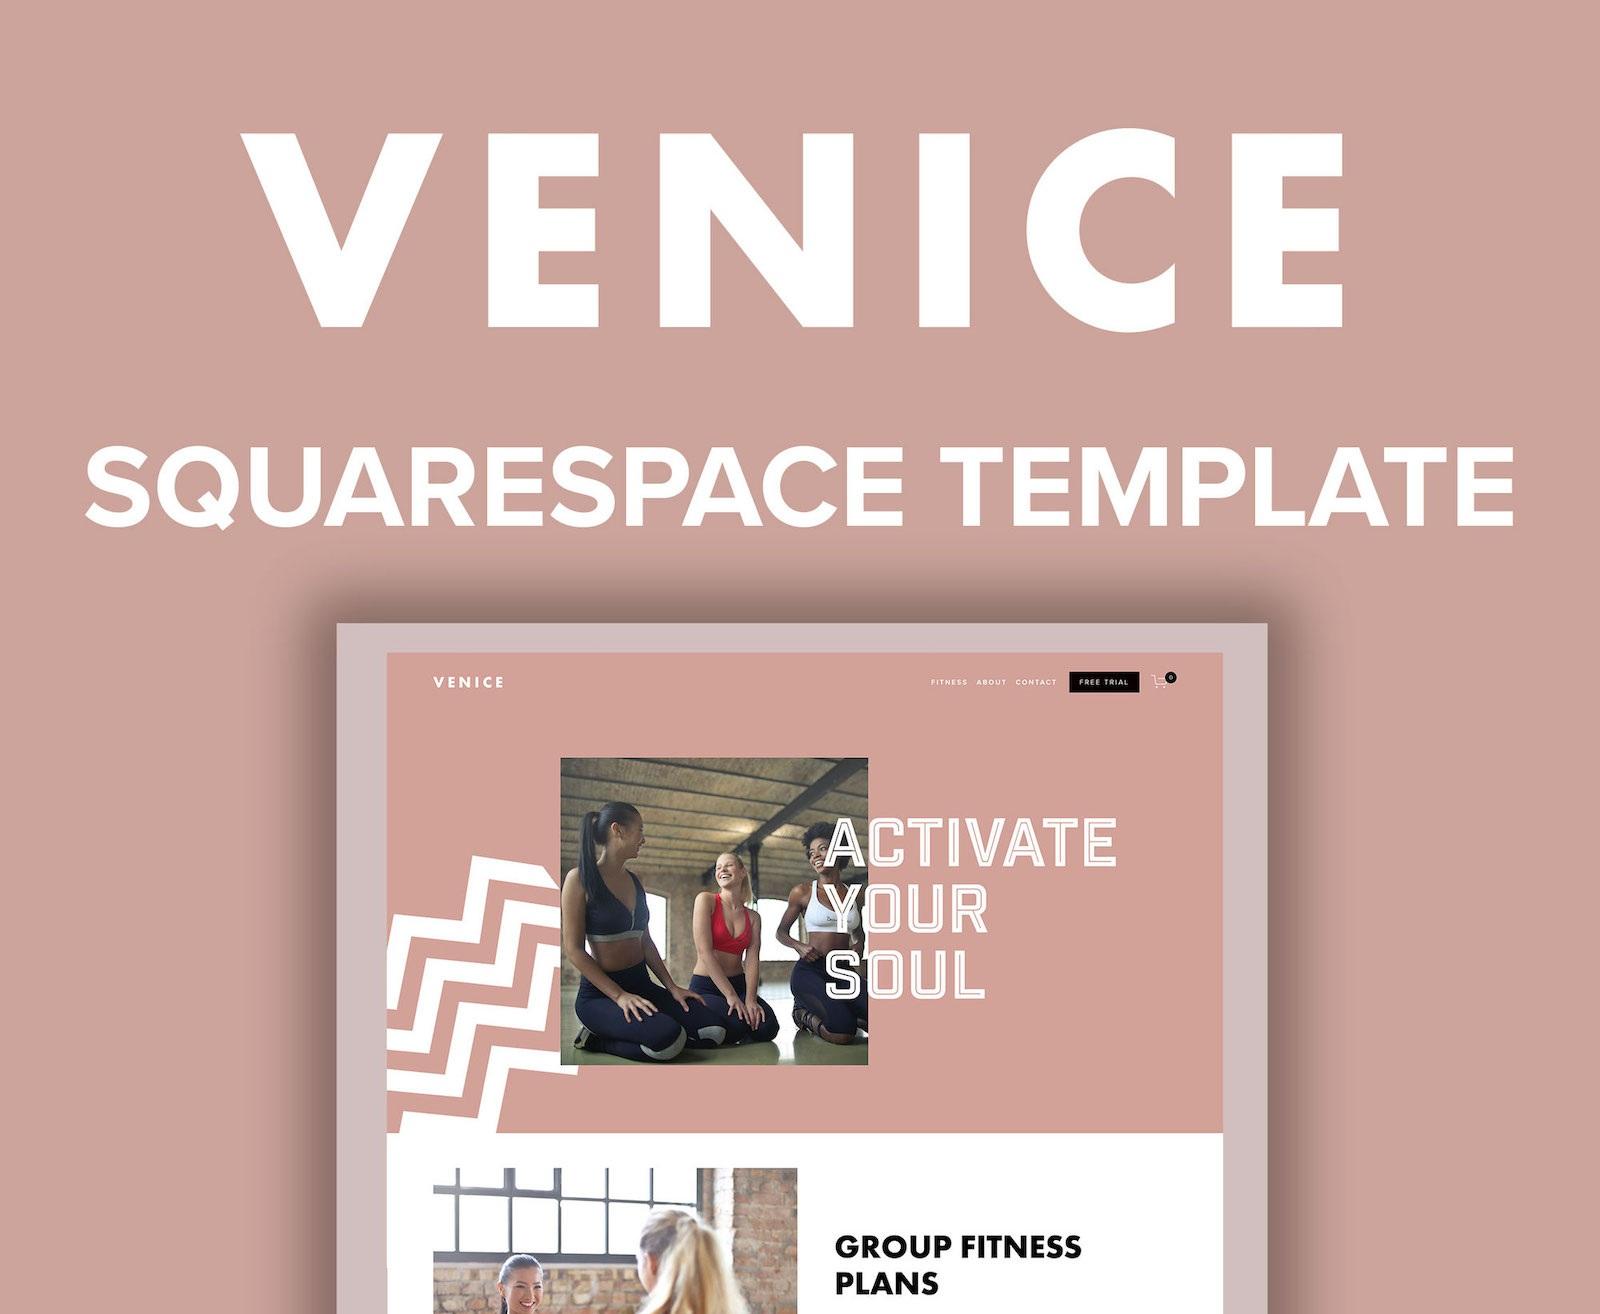 Venice Squarespace Template